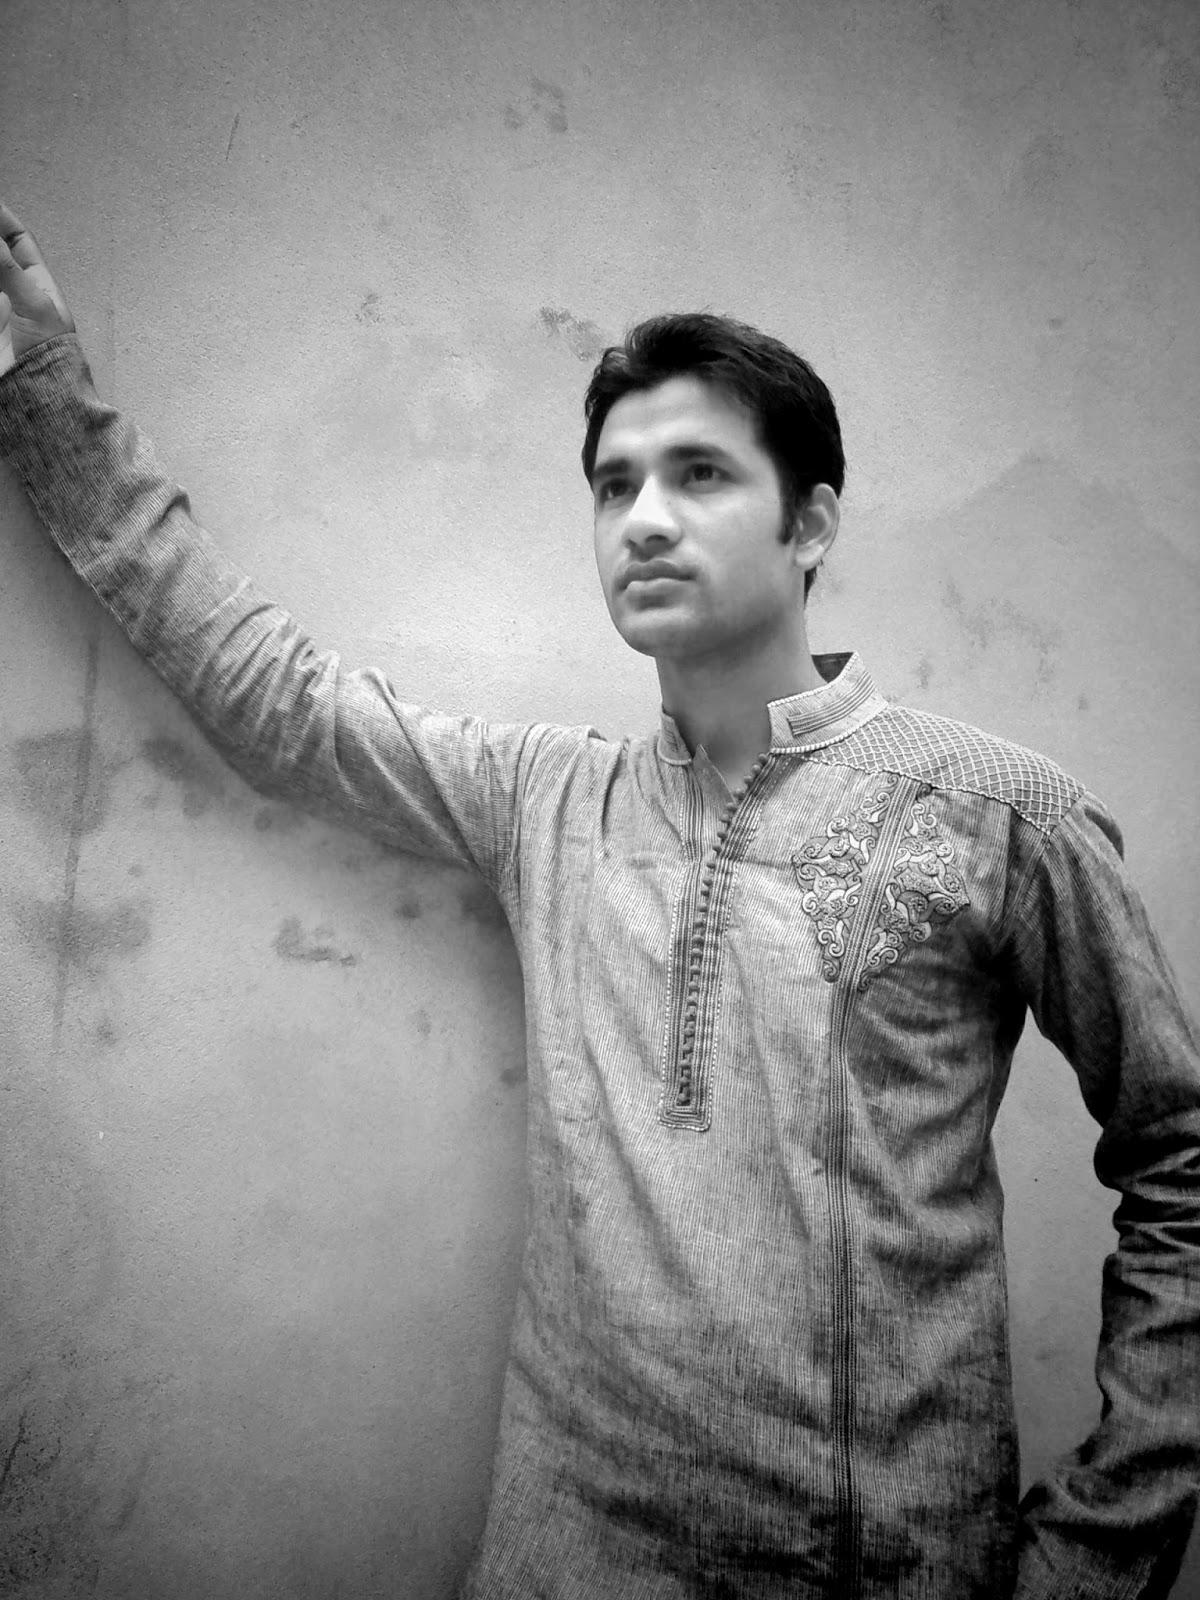 Md. Shahadath Hossain